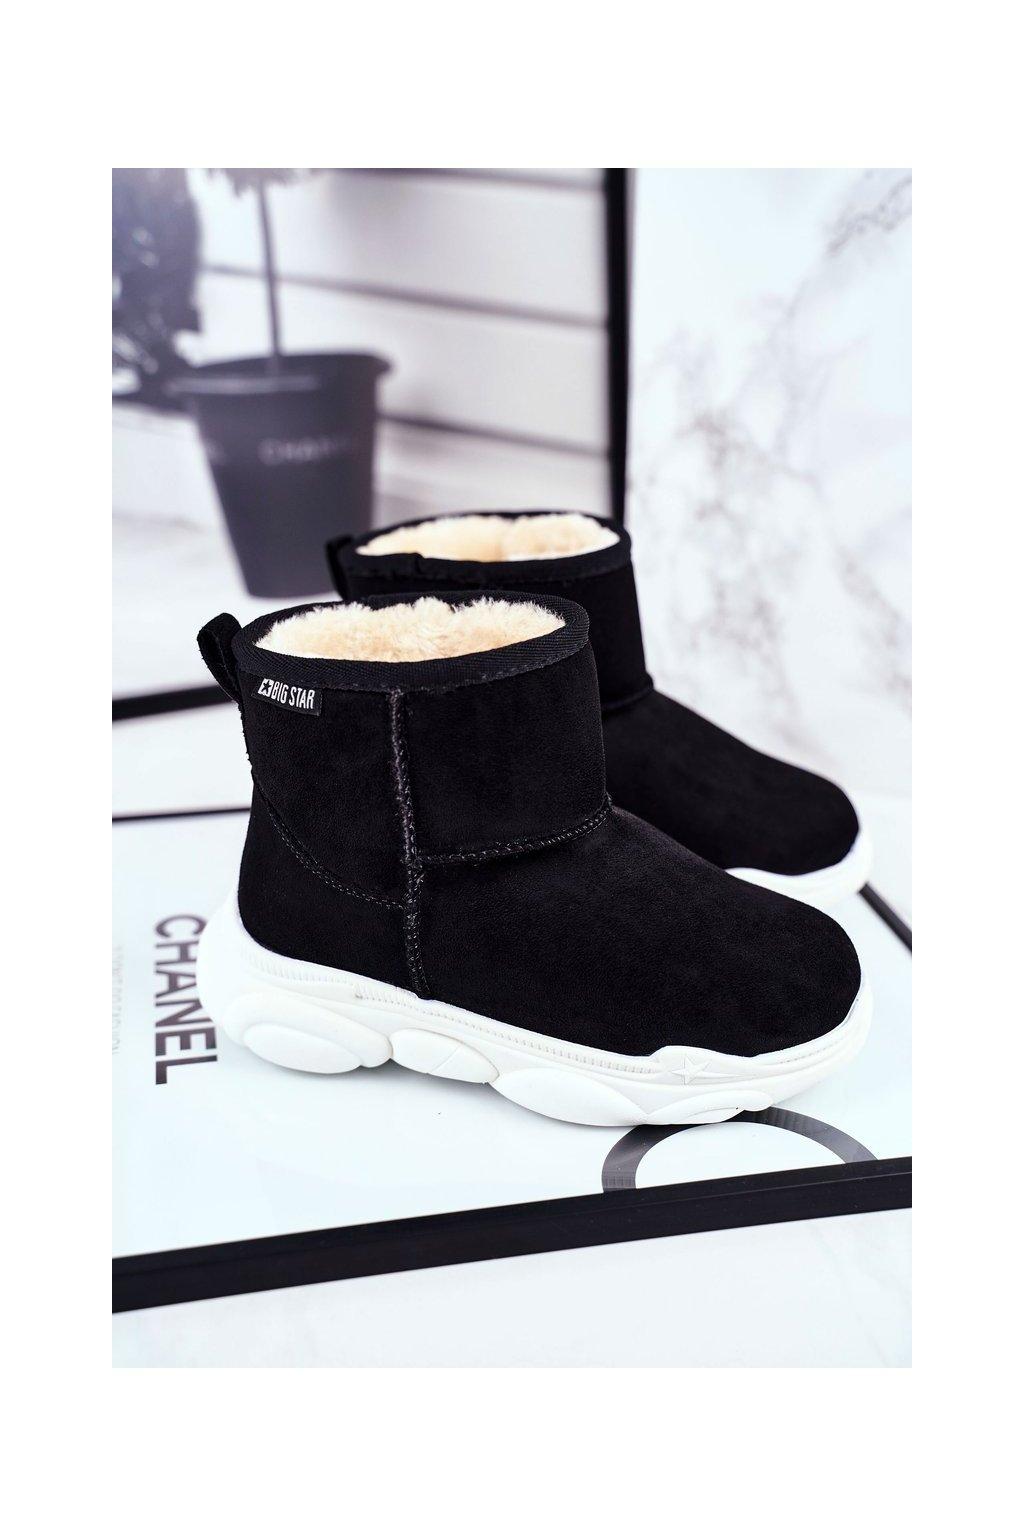 Sivá obuv kód topánok GG374085 DK.GREY